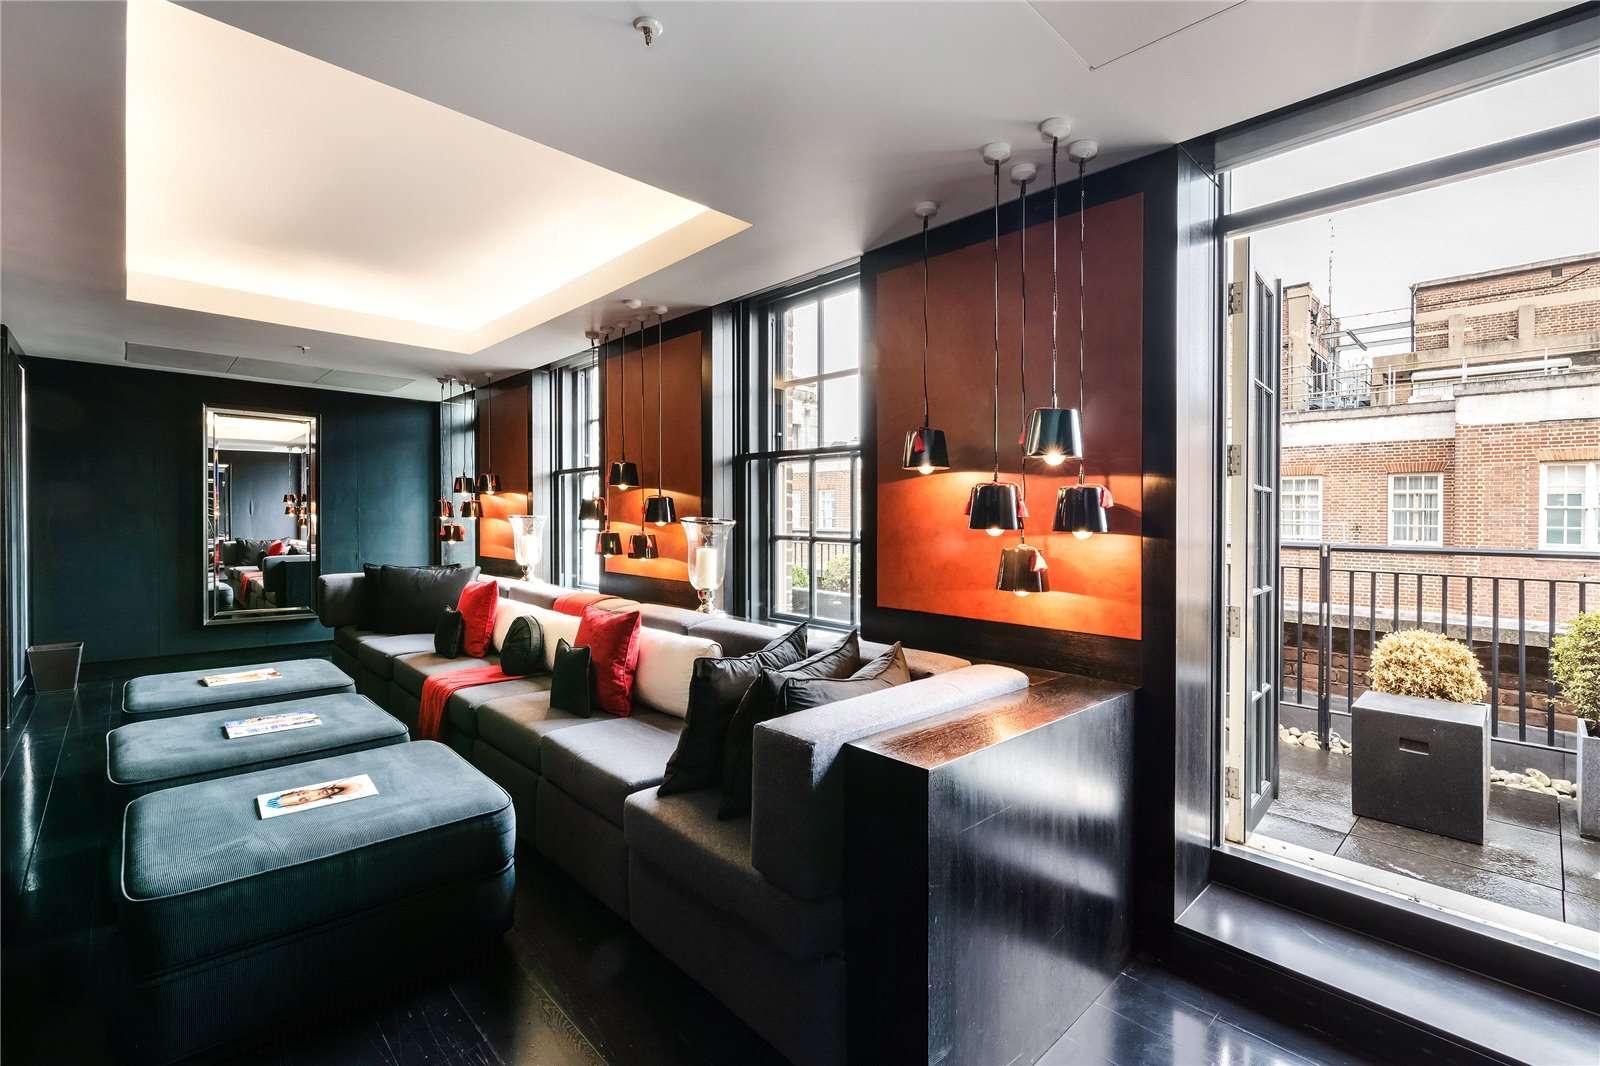 Grosvenor House Suites86 Park Lane Mayfair London W1k 7tn